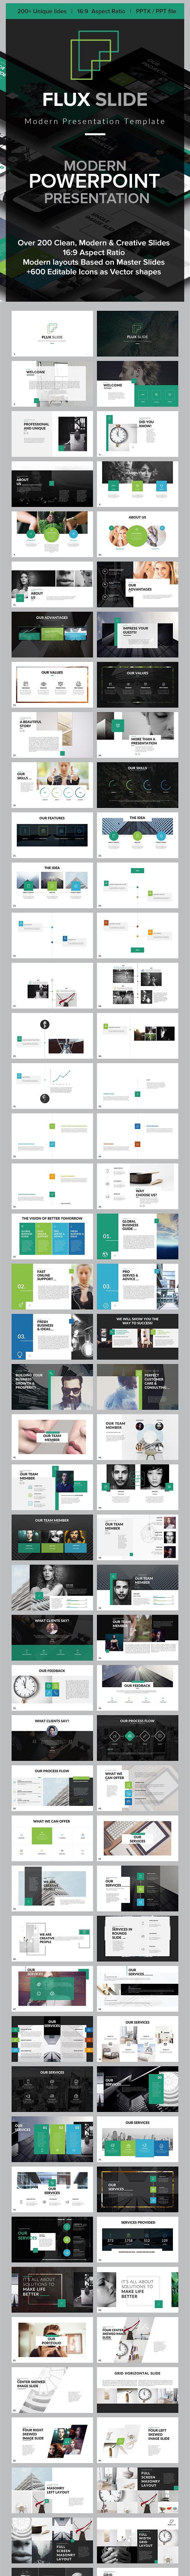 Flux Slides PowerPoint Template - Creative PowerPoint Templates